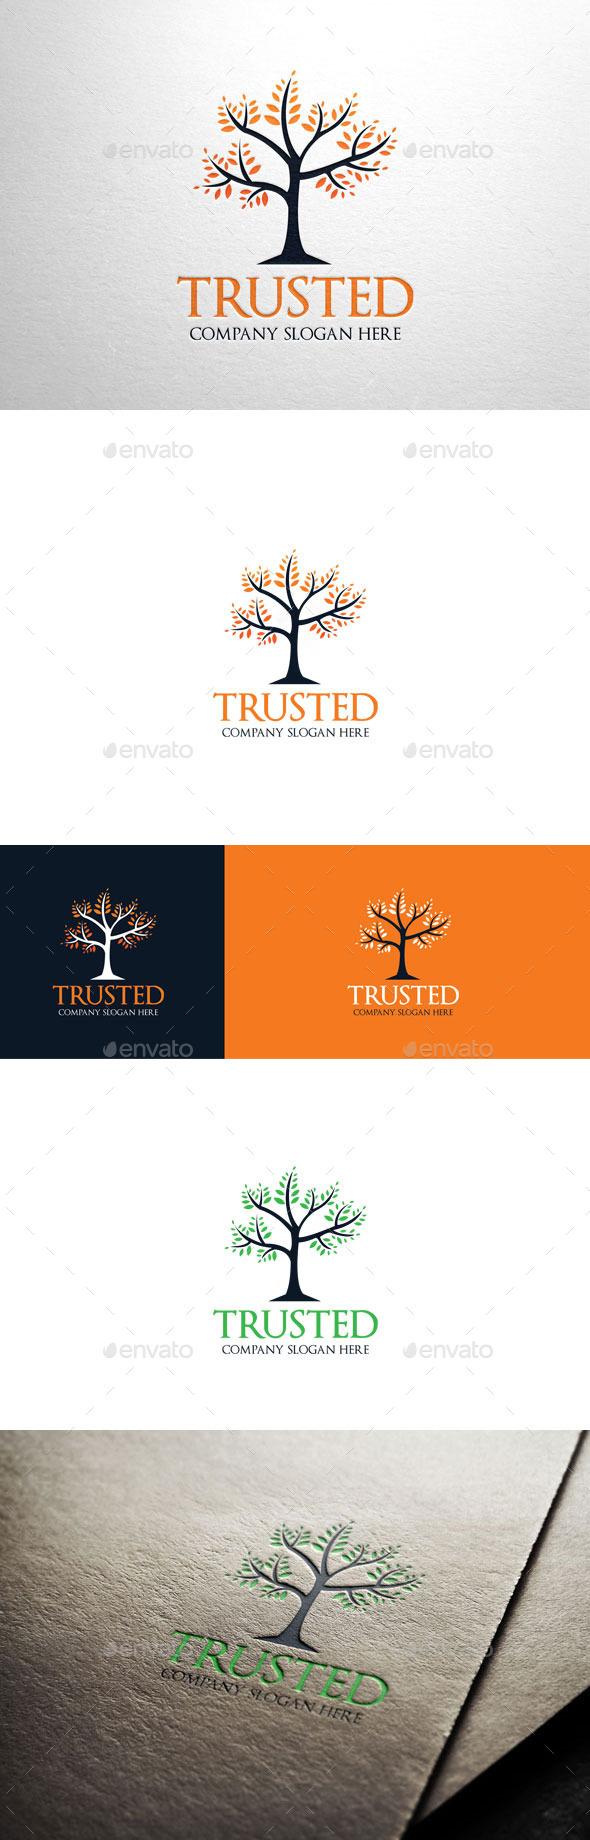 GraphicRiver Trusted 10510425